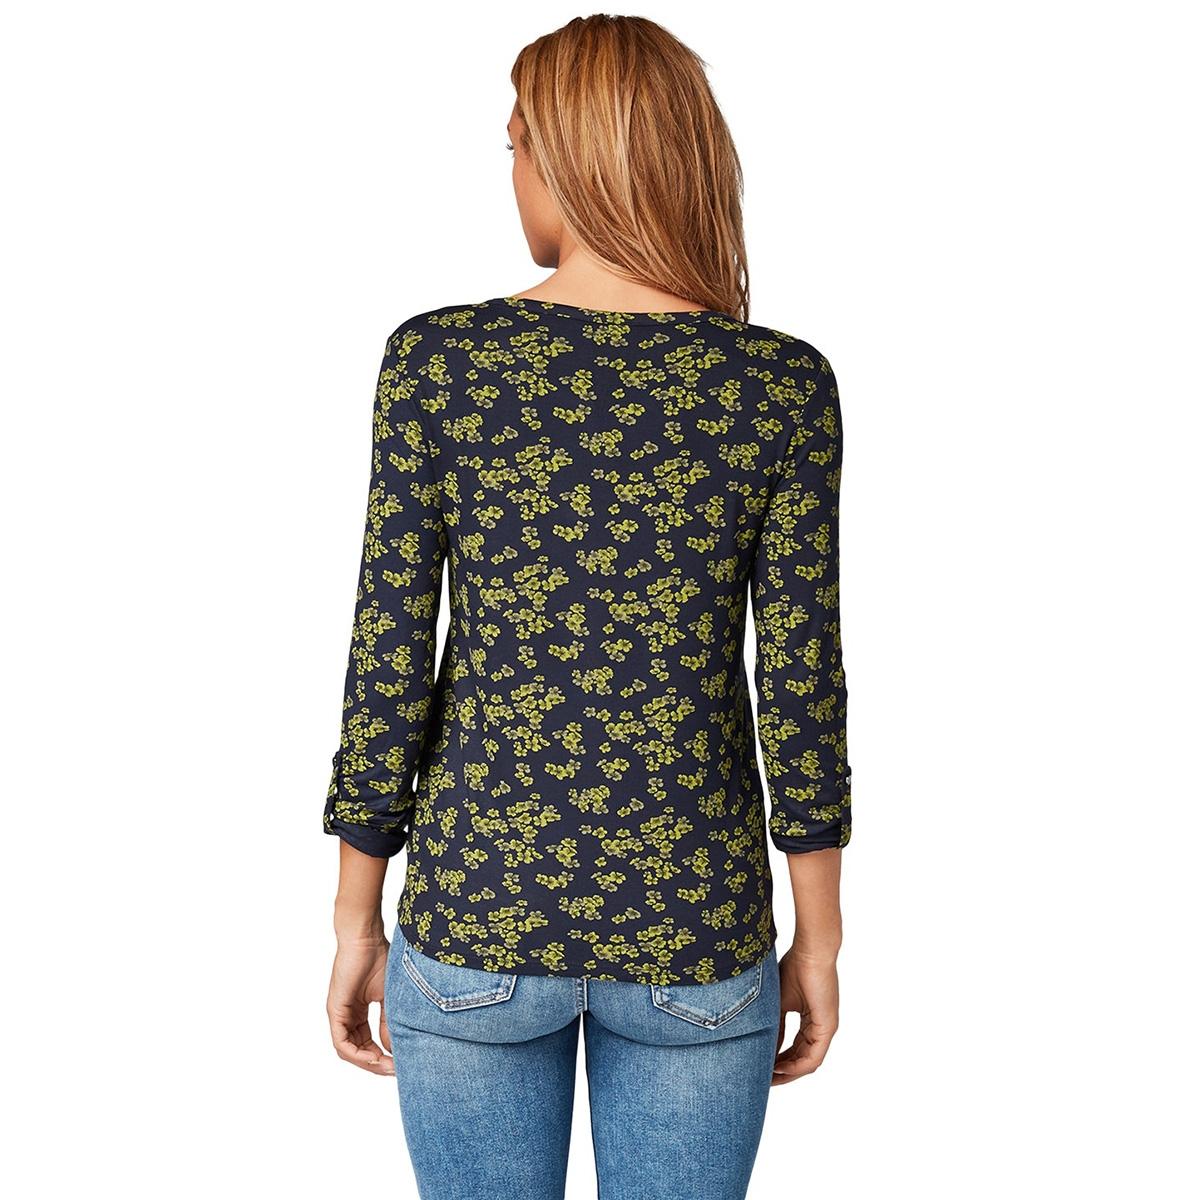 t shirt met bloemen print 1014881xx70 tom tailor t-shirt 20595